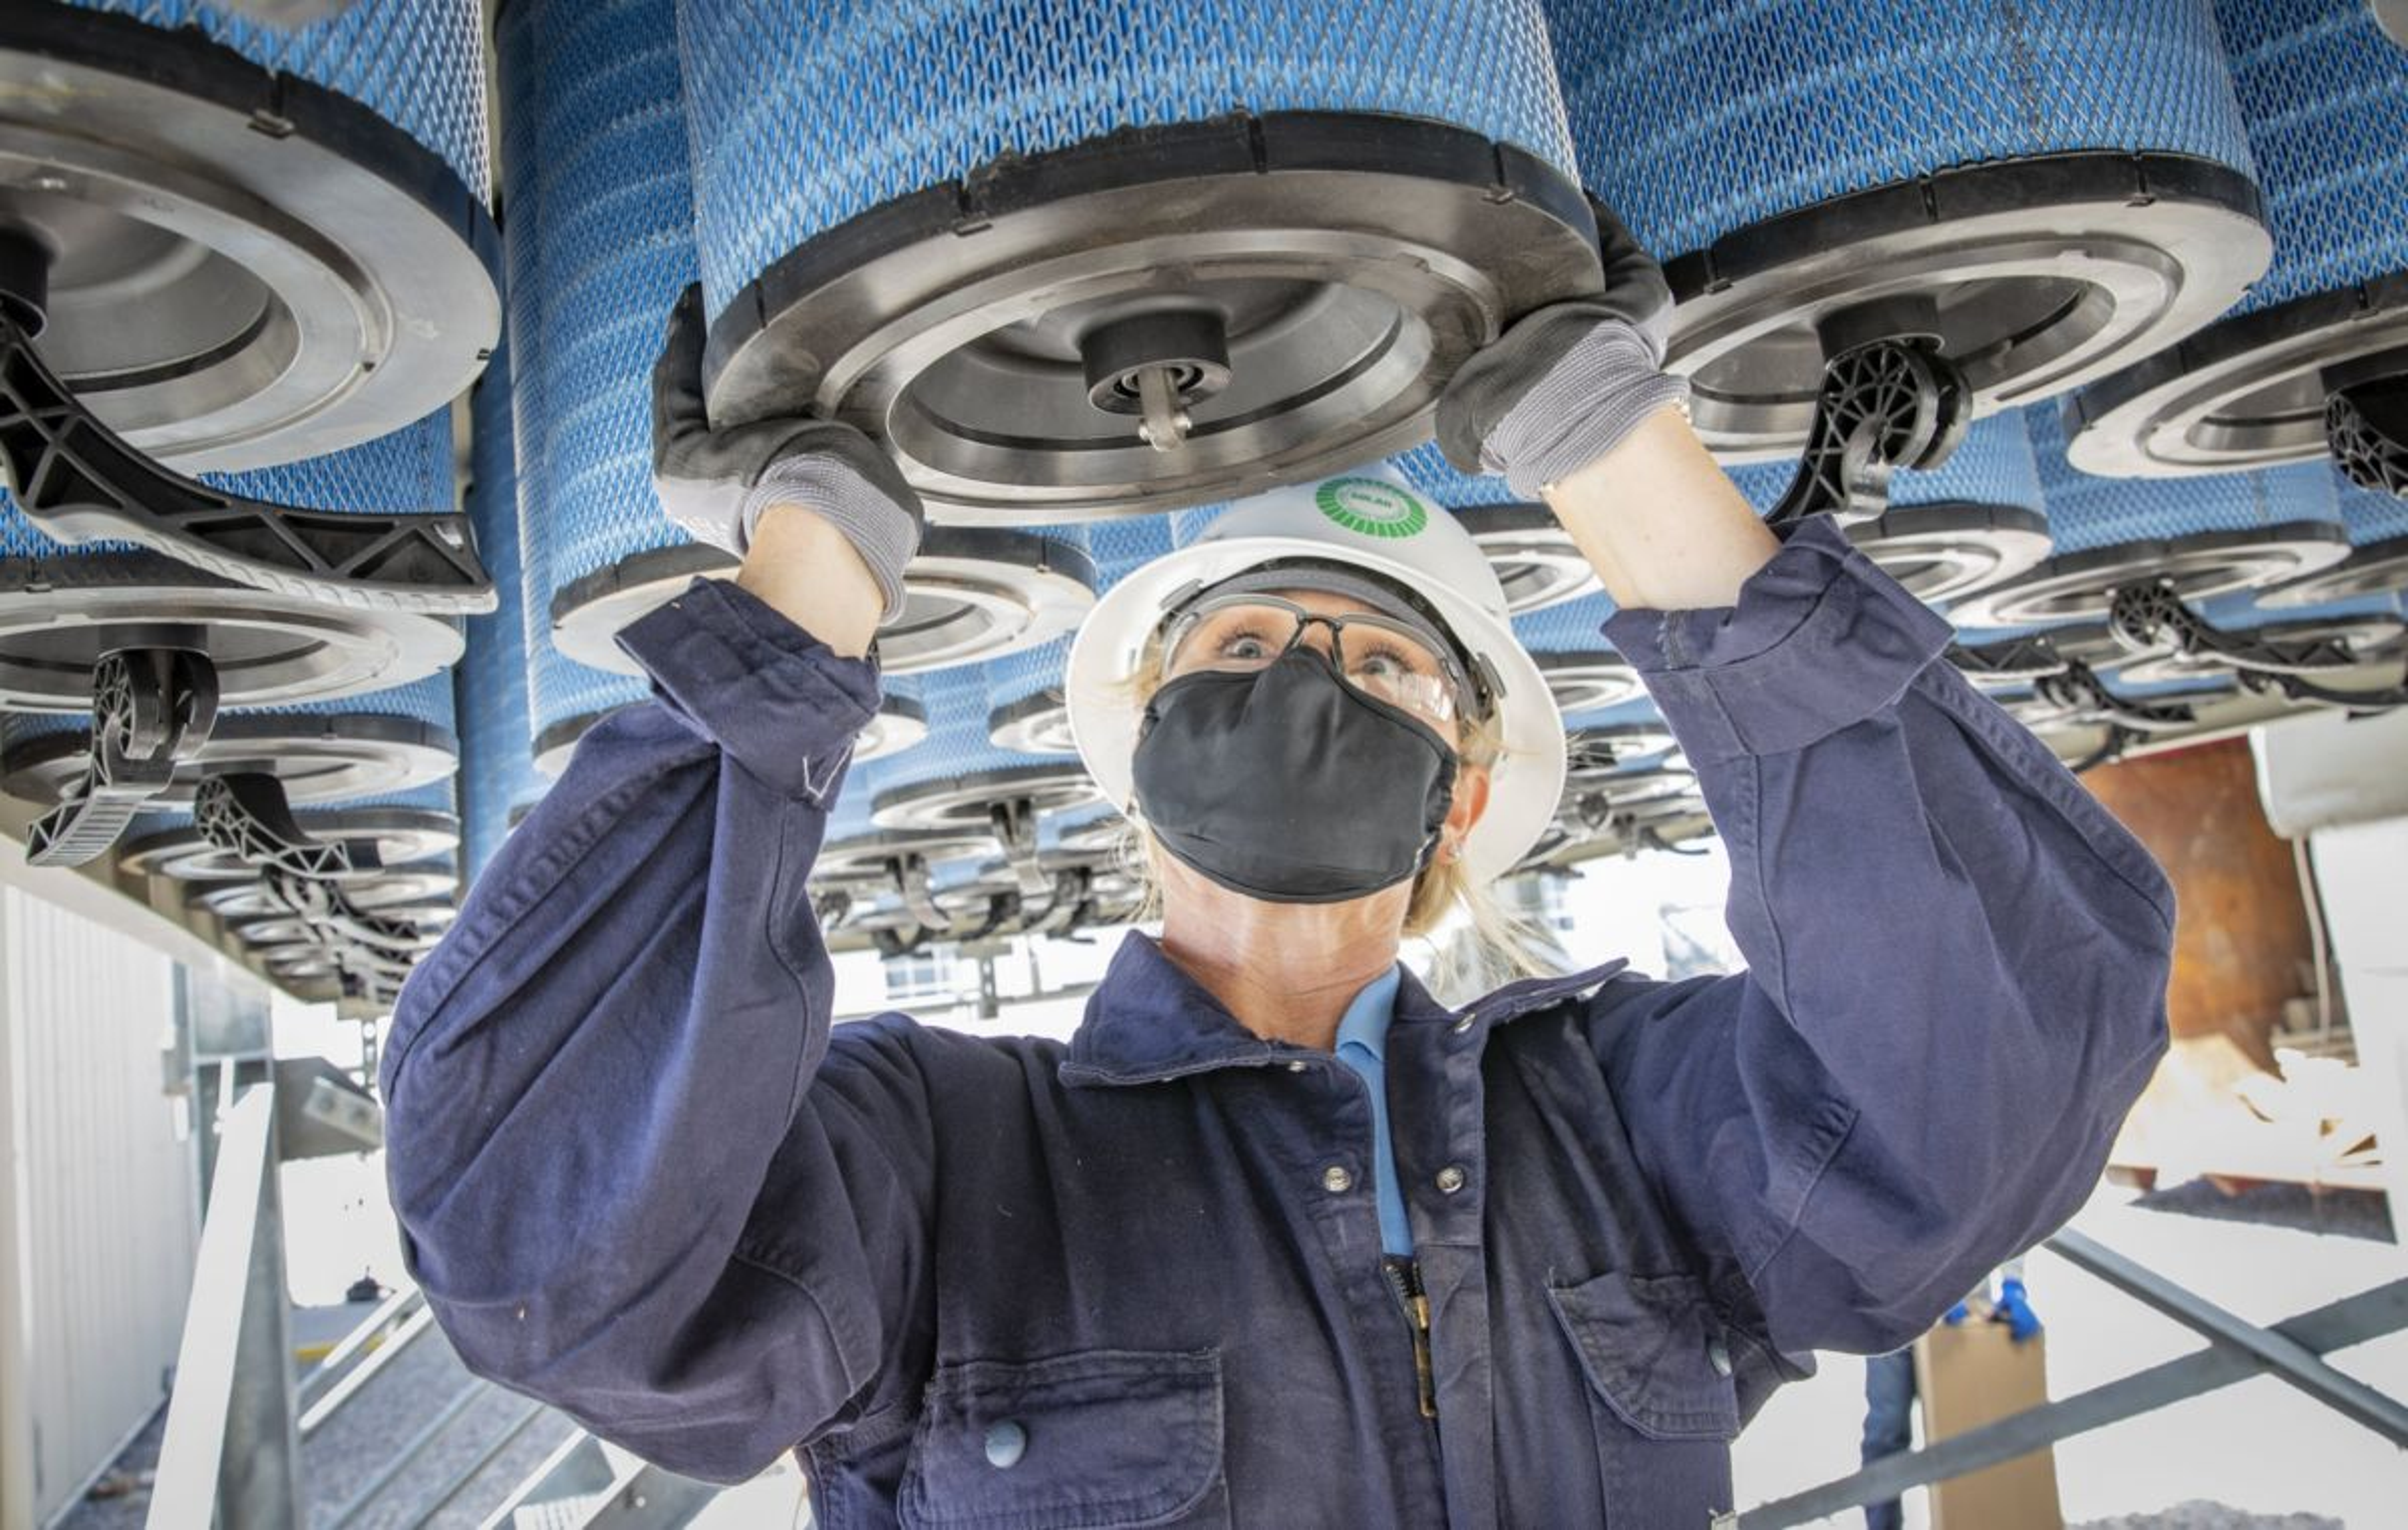 Field Service Engineer – Gas Turbine Mechanical (Service Engineer)- Well paid